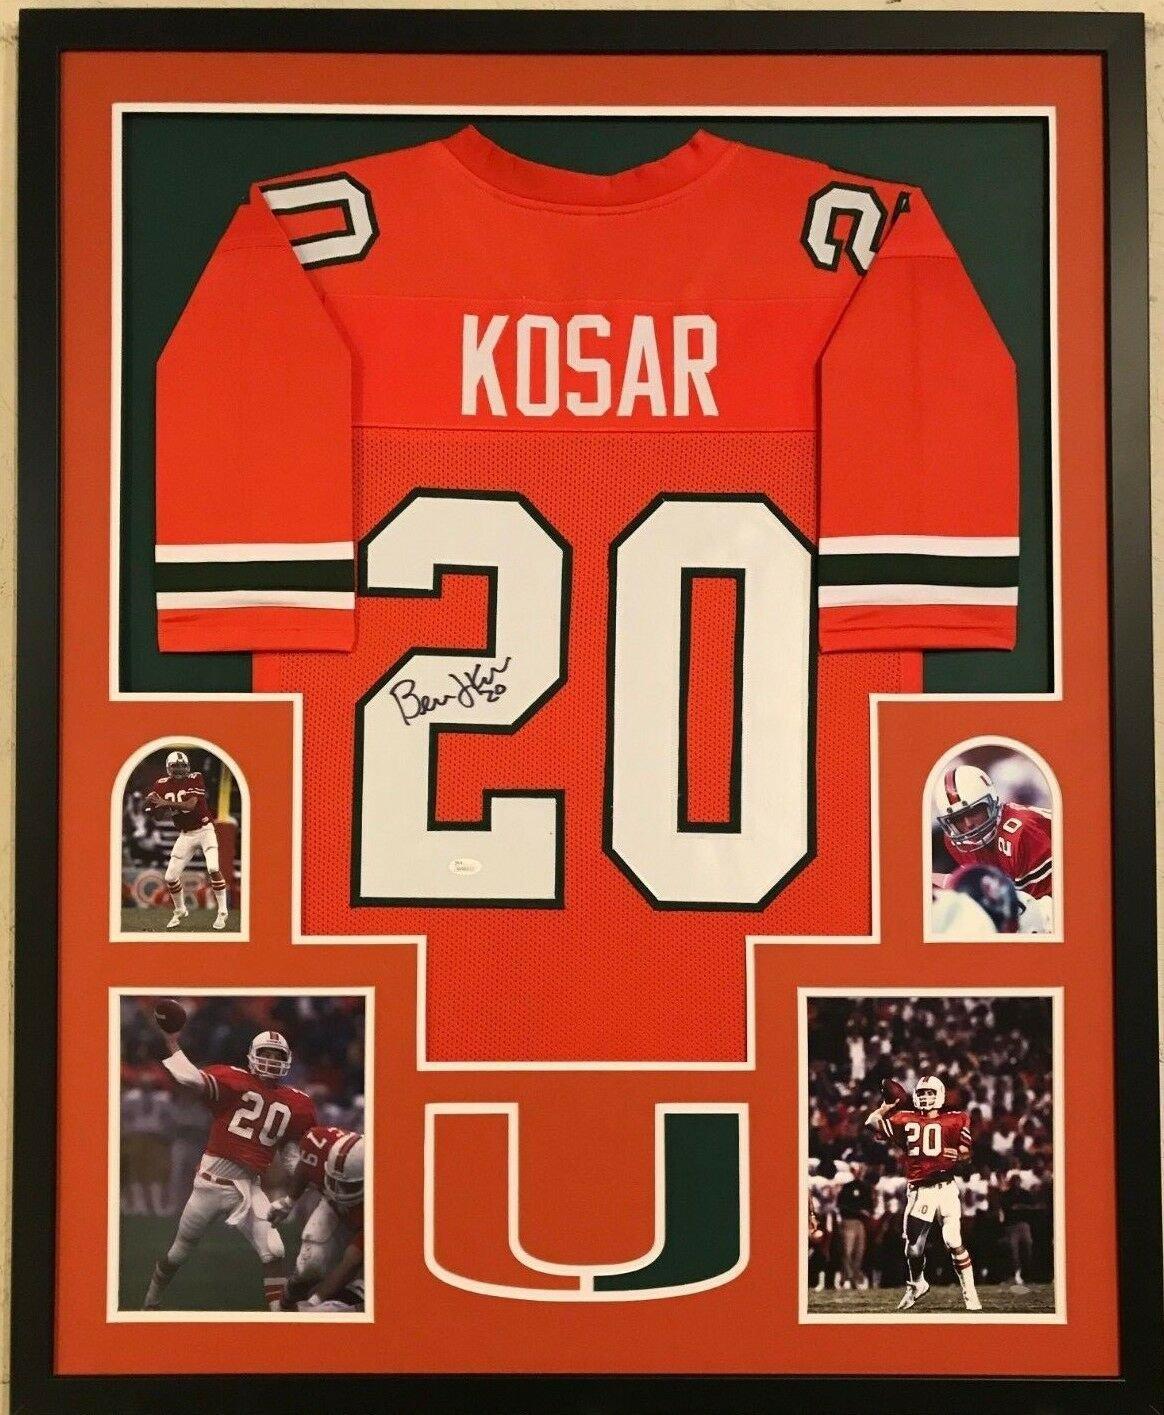 Bernie Kosar Autographed Signed Framed Miami Hurricanes Jersey JSA